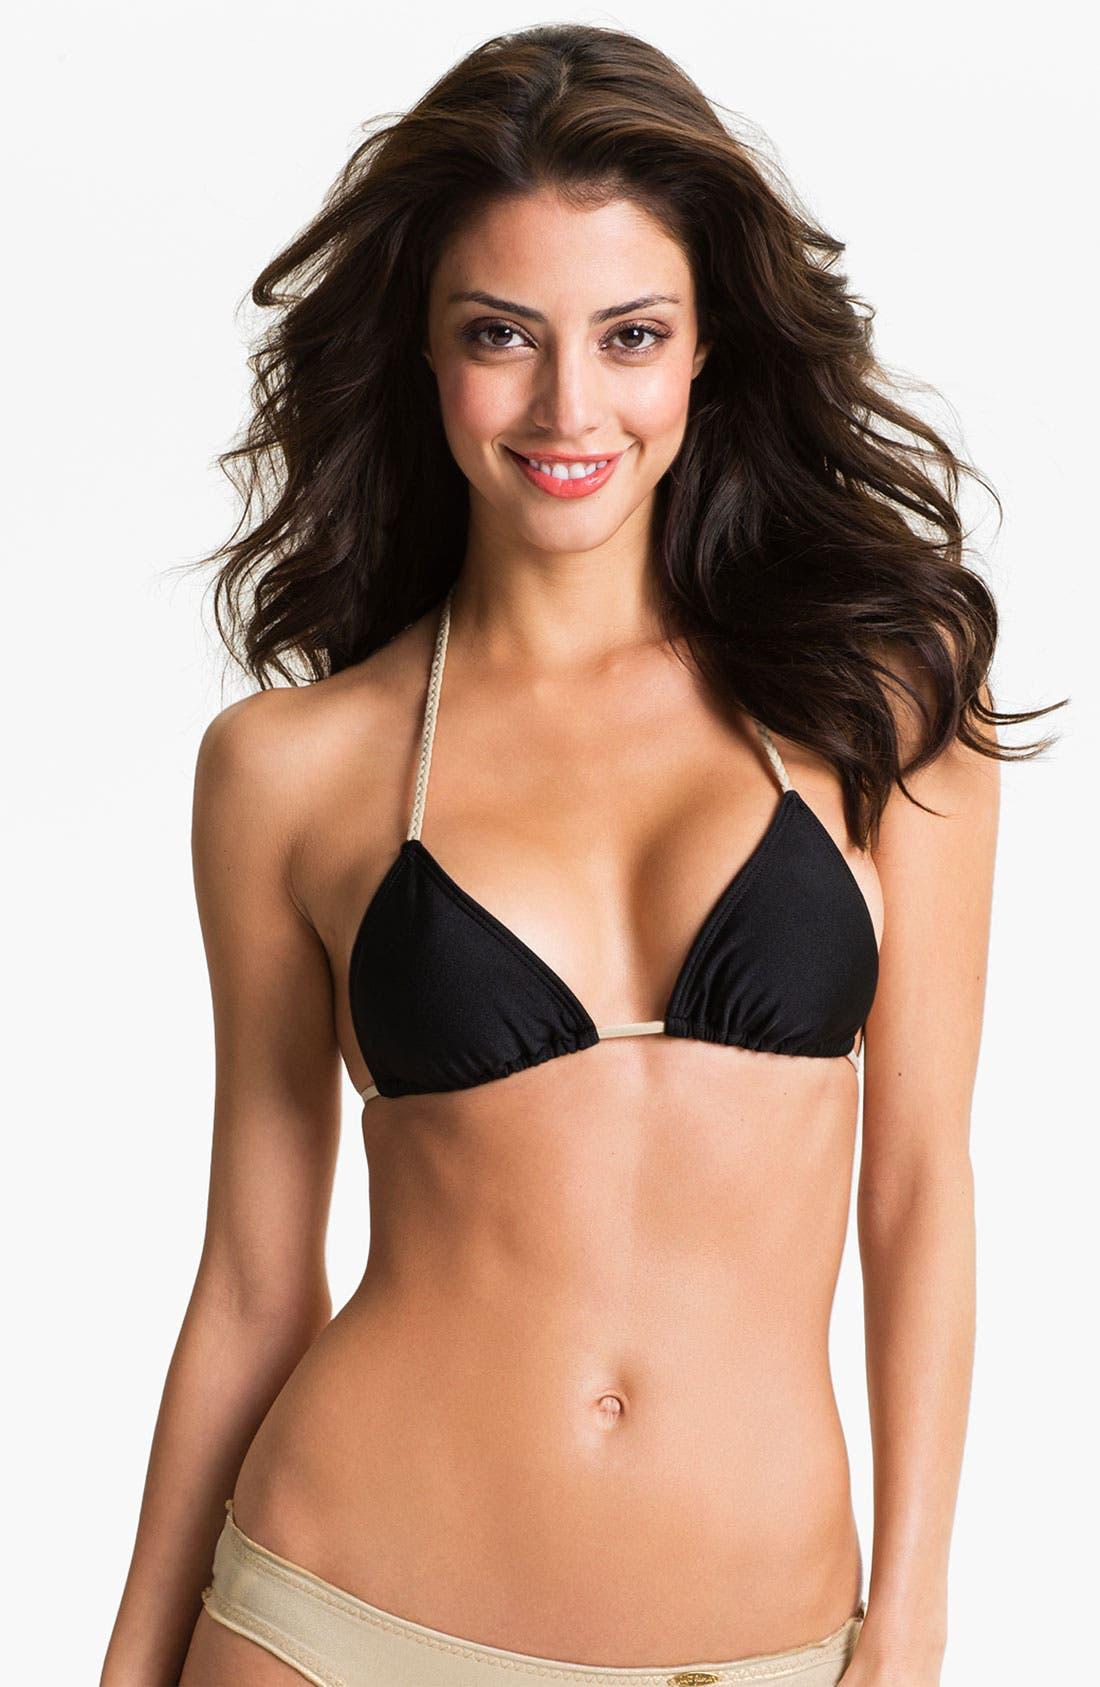 Alternate Image 1 Selected - Luli Fama Braided Strap Triangle Bikini Top